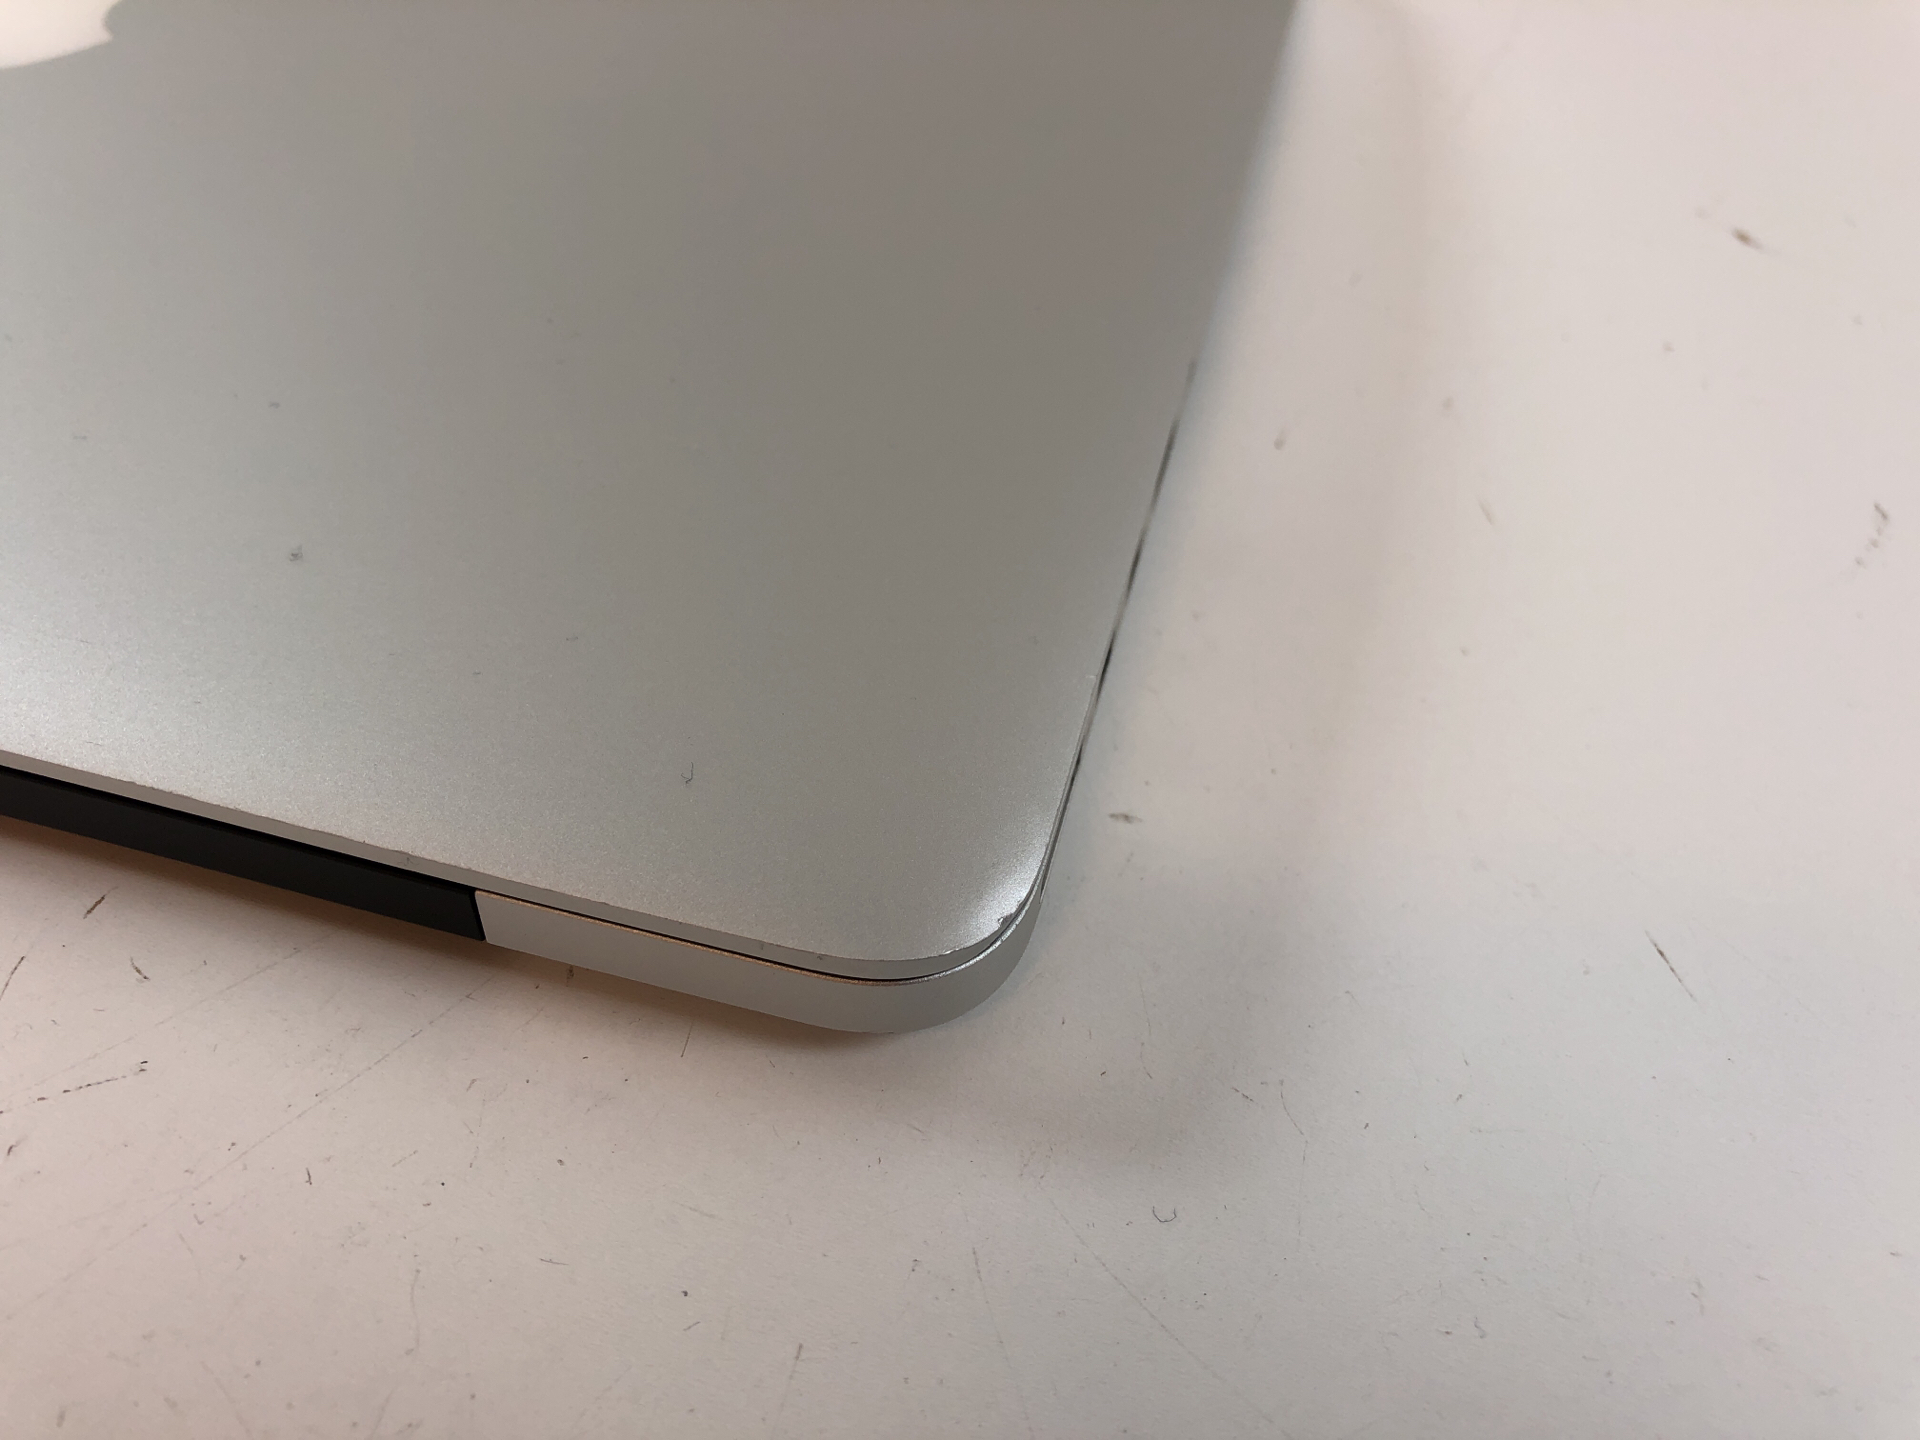 "MacBook Pro Retina 13"" Late 2013 (Intel Core i5 2.6 GHz 16 GB RAM 512 GB SSD), Intel Core i5 2.6 GHz, 16 GB RAM, 512 GB SSD, Kuva 4"